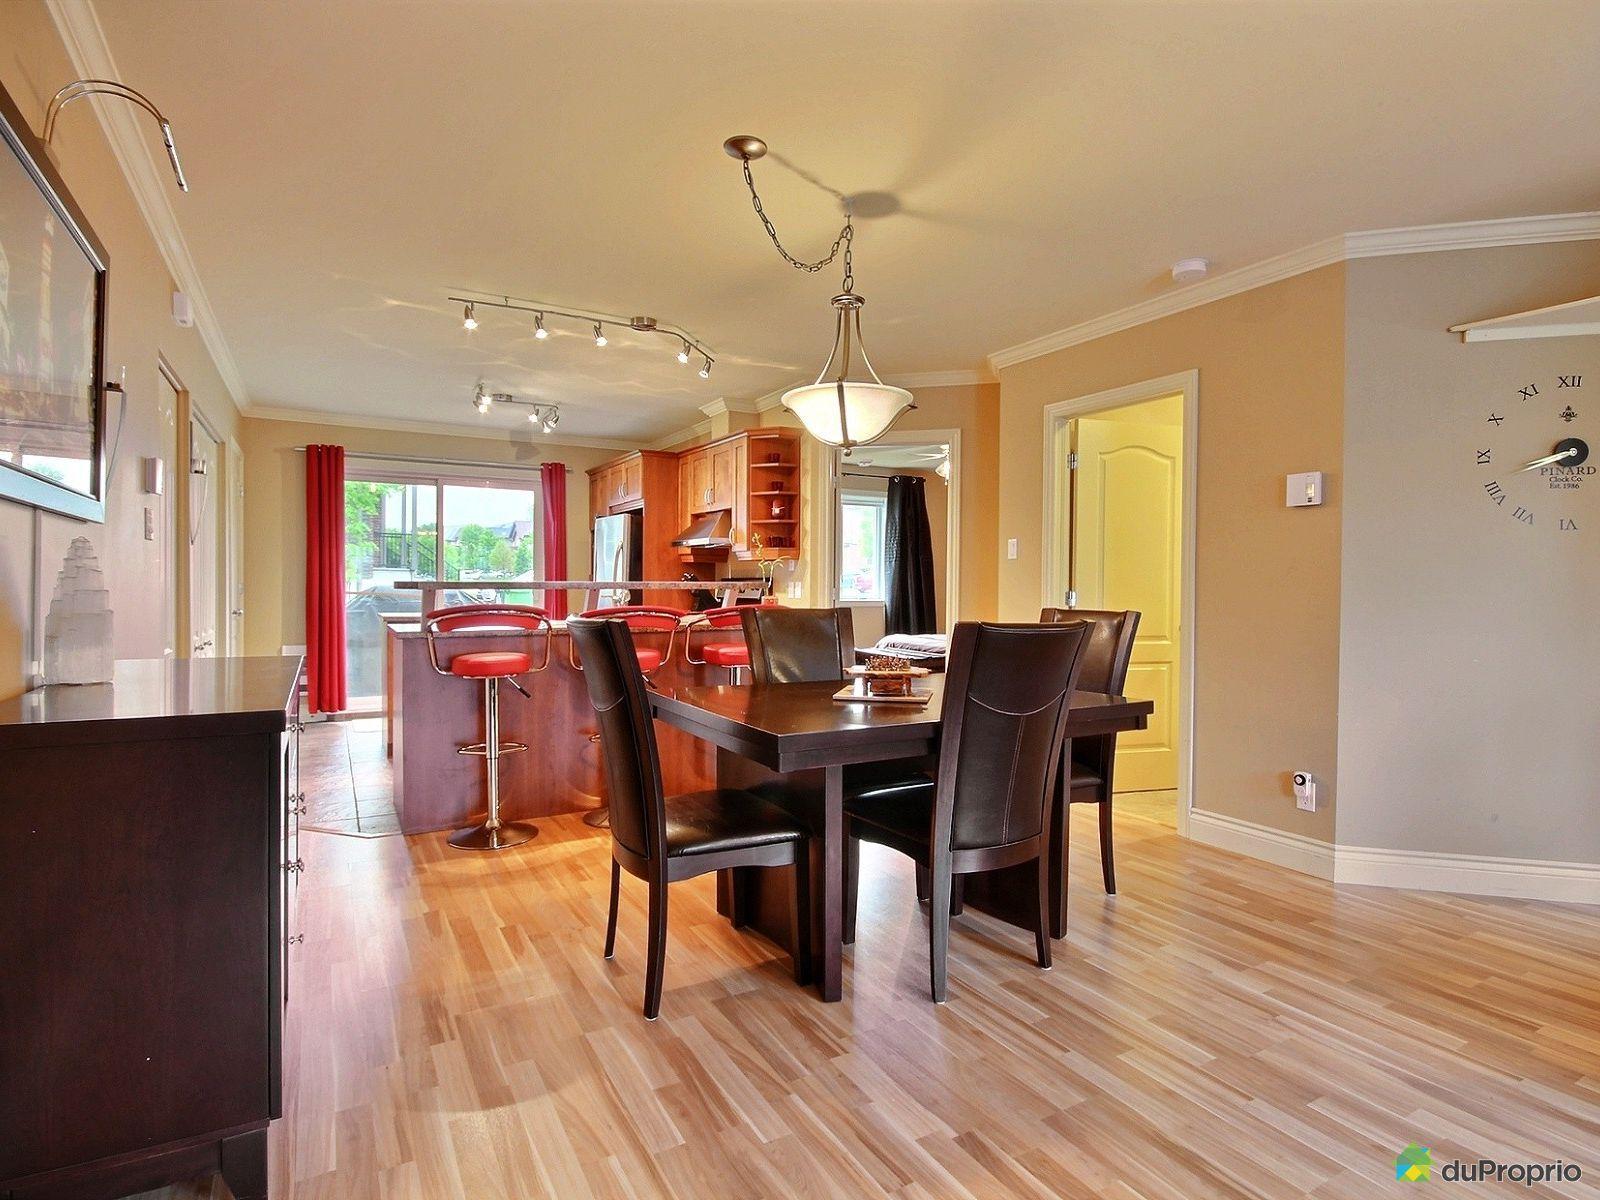 Condo vendre sherbrooke 1325 rue marini immobilier - Amortissement appartement meuble ...